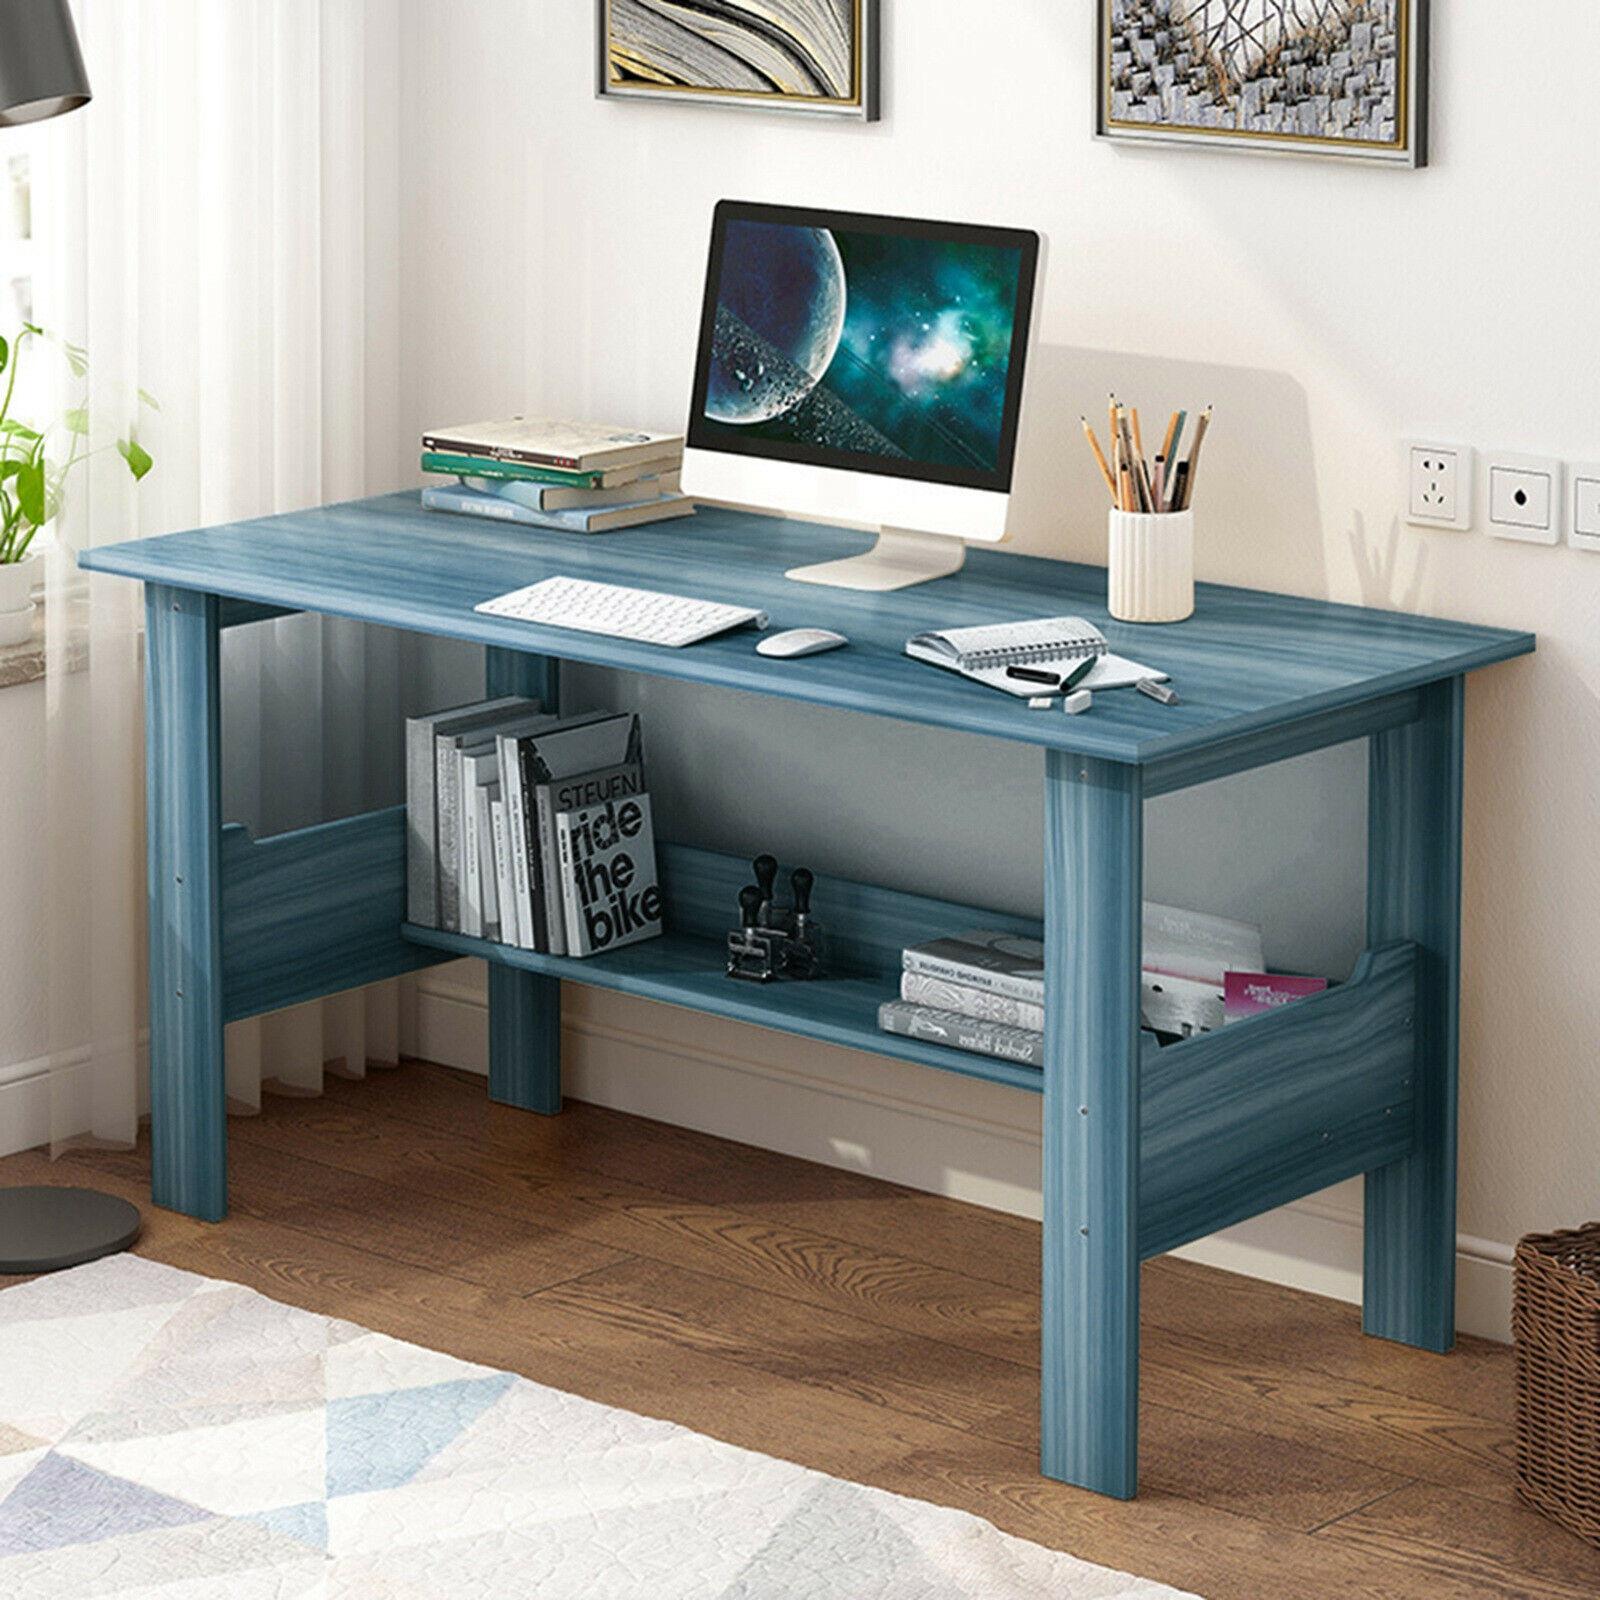 Ikea Linnmon Adils Table Desk Computer Workstation White Blue 39 For Sale Online Ebay